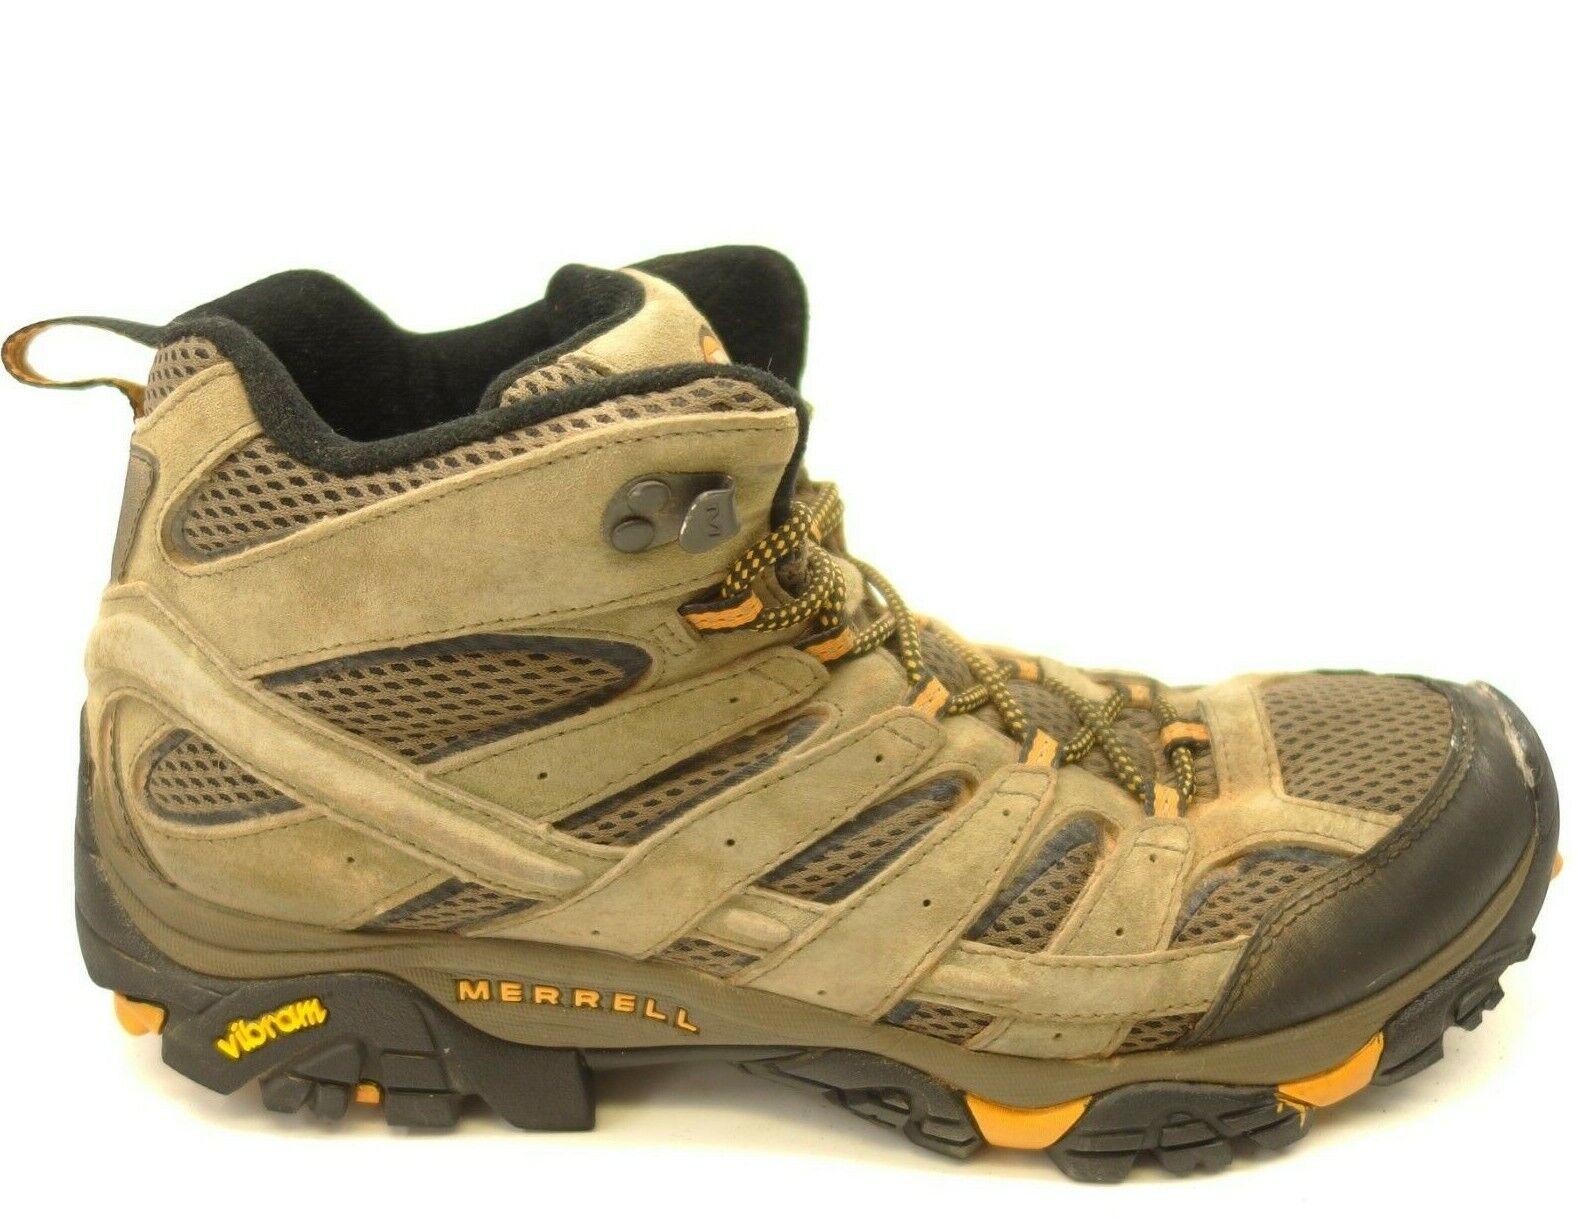 Merrell Moab 2 US 10.5 Marrón Vibram para senderismo y zapatos botas para hombre